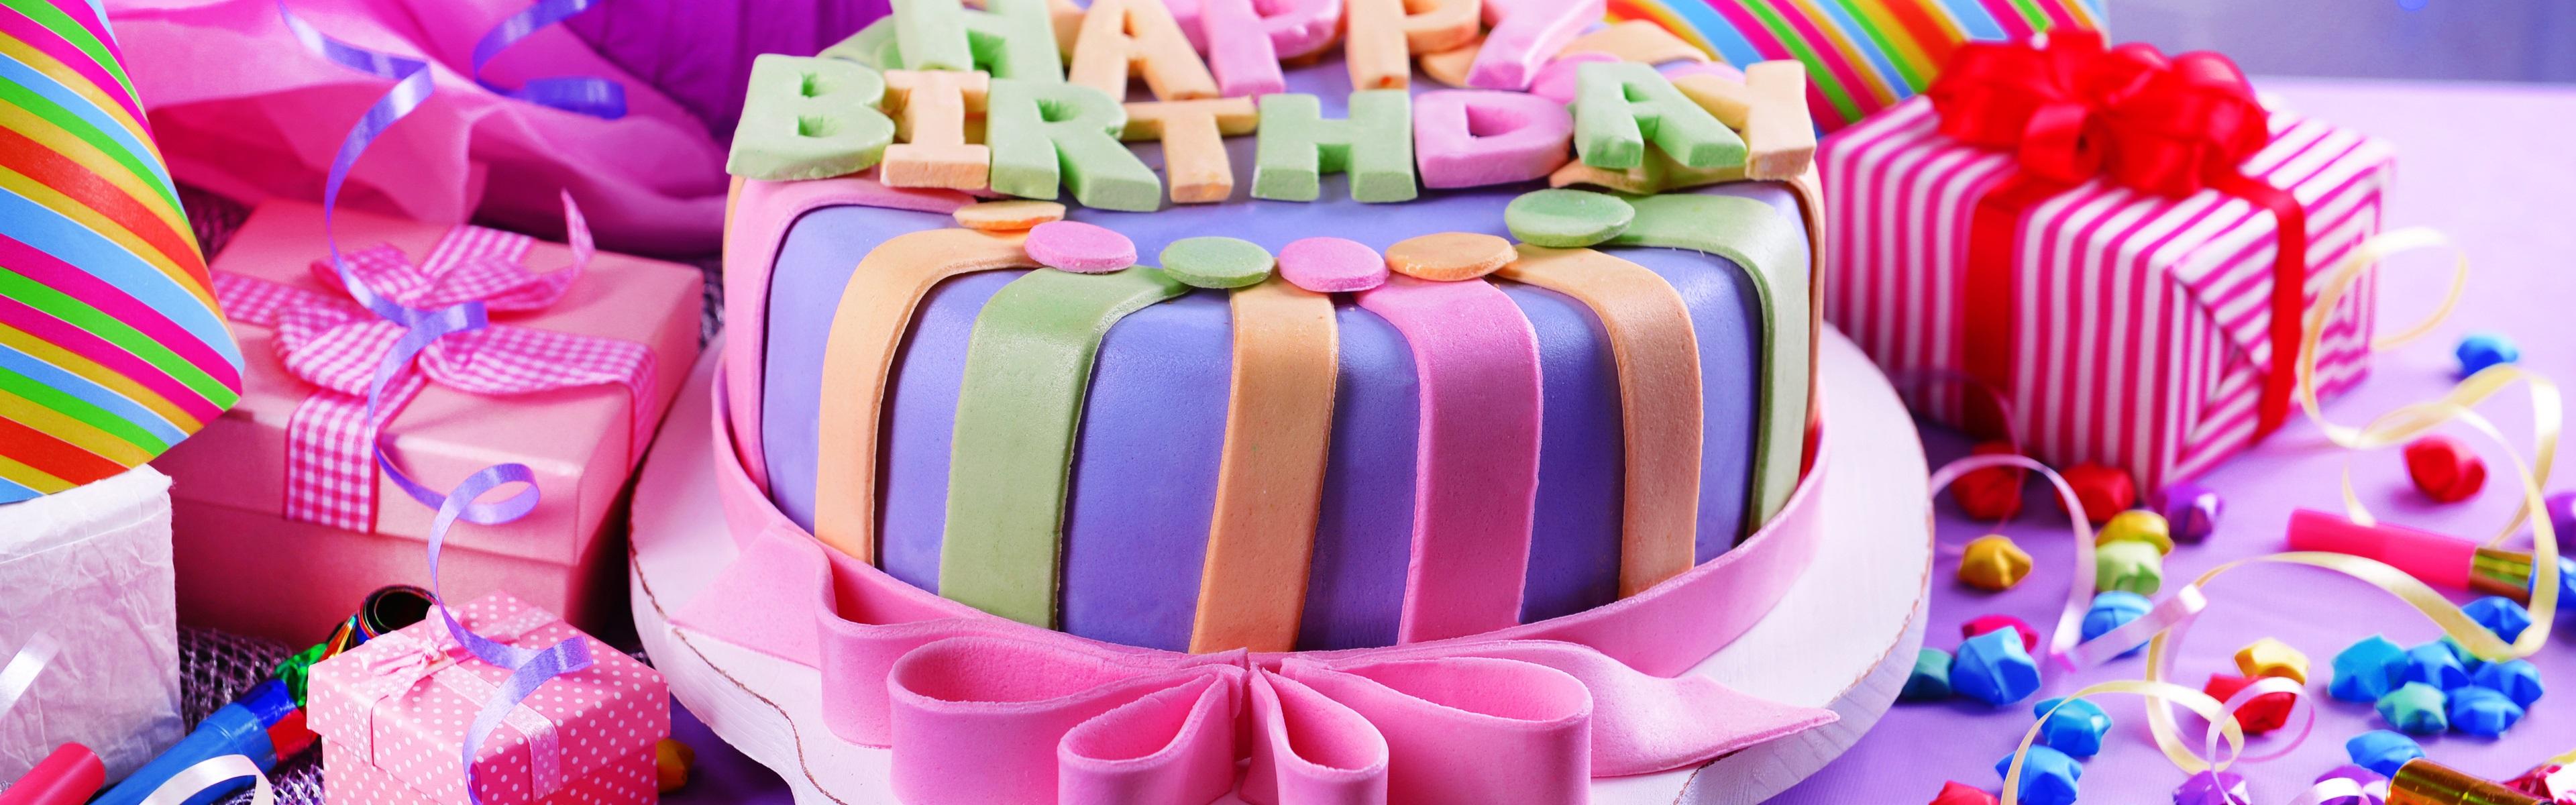 Матери, открытка торт подарок